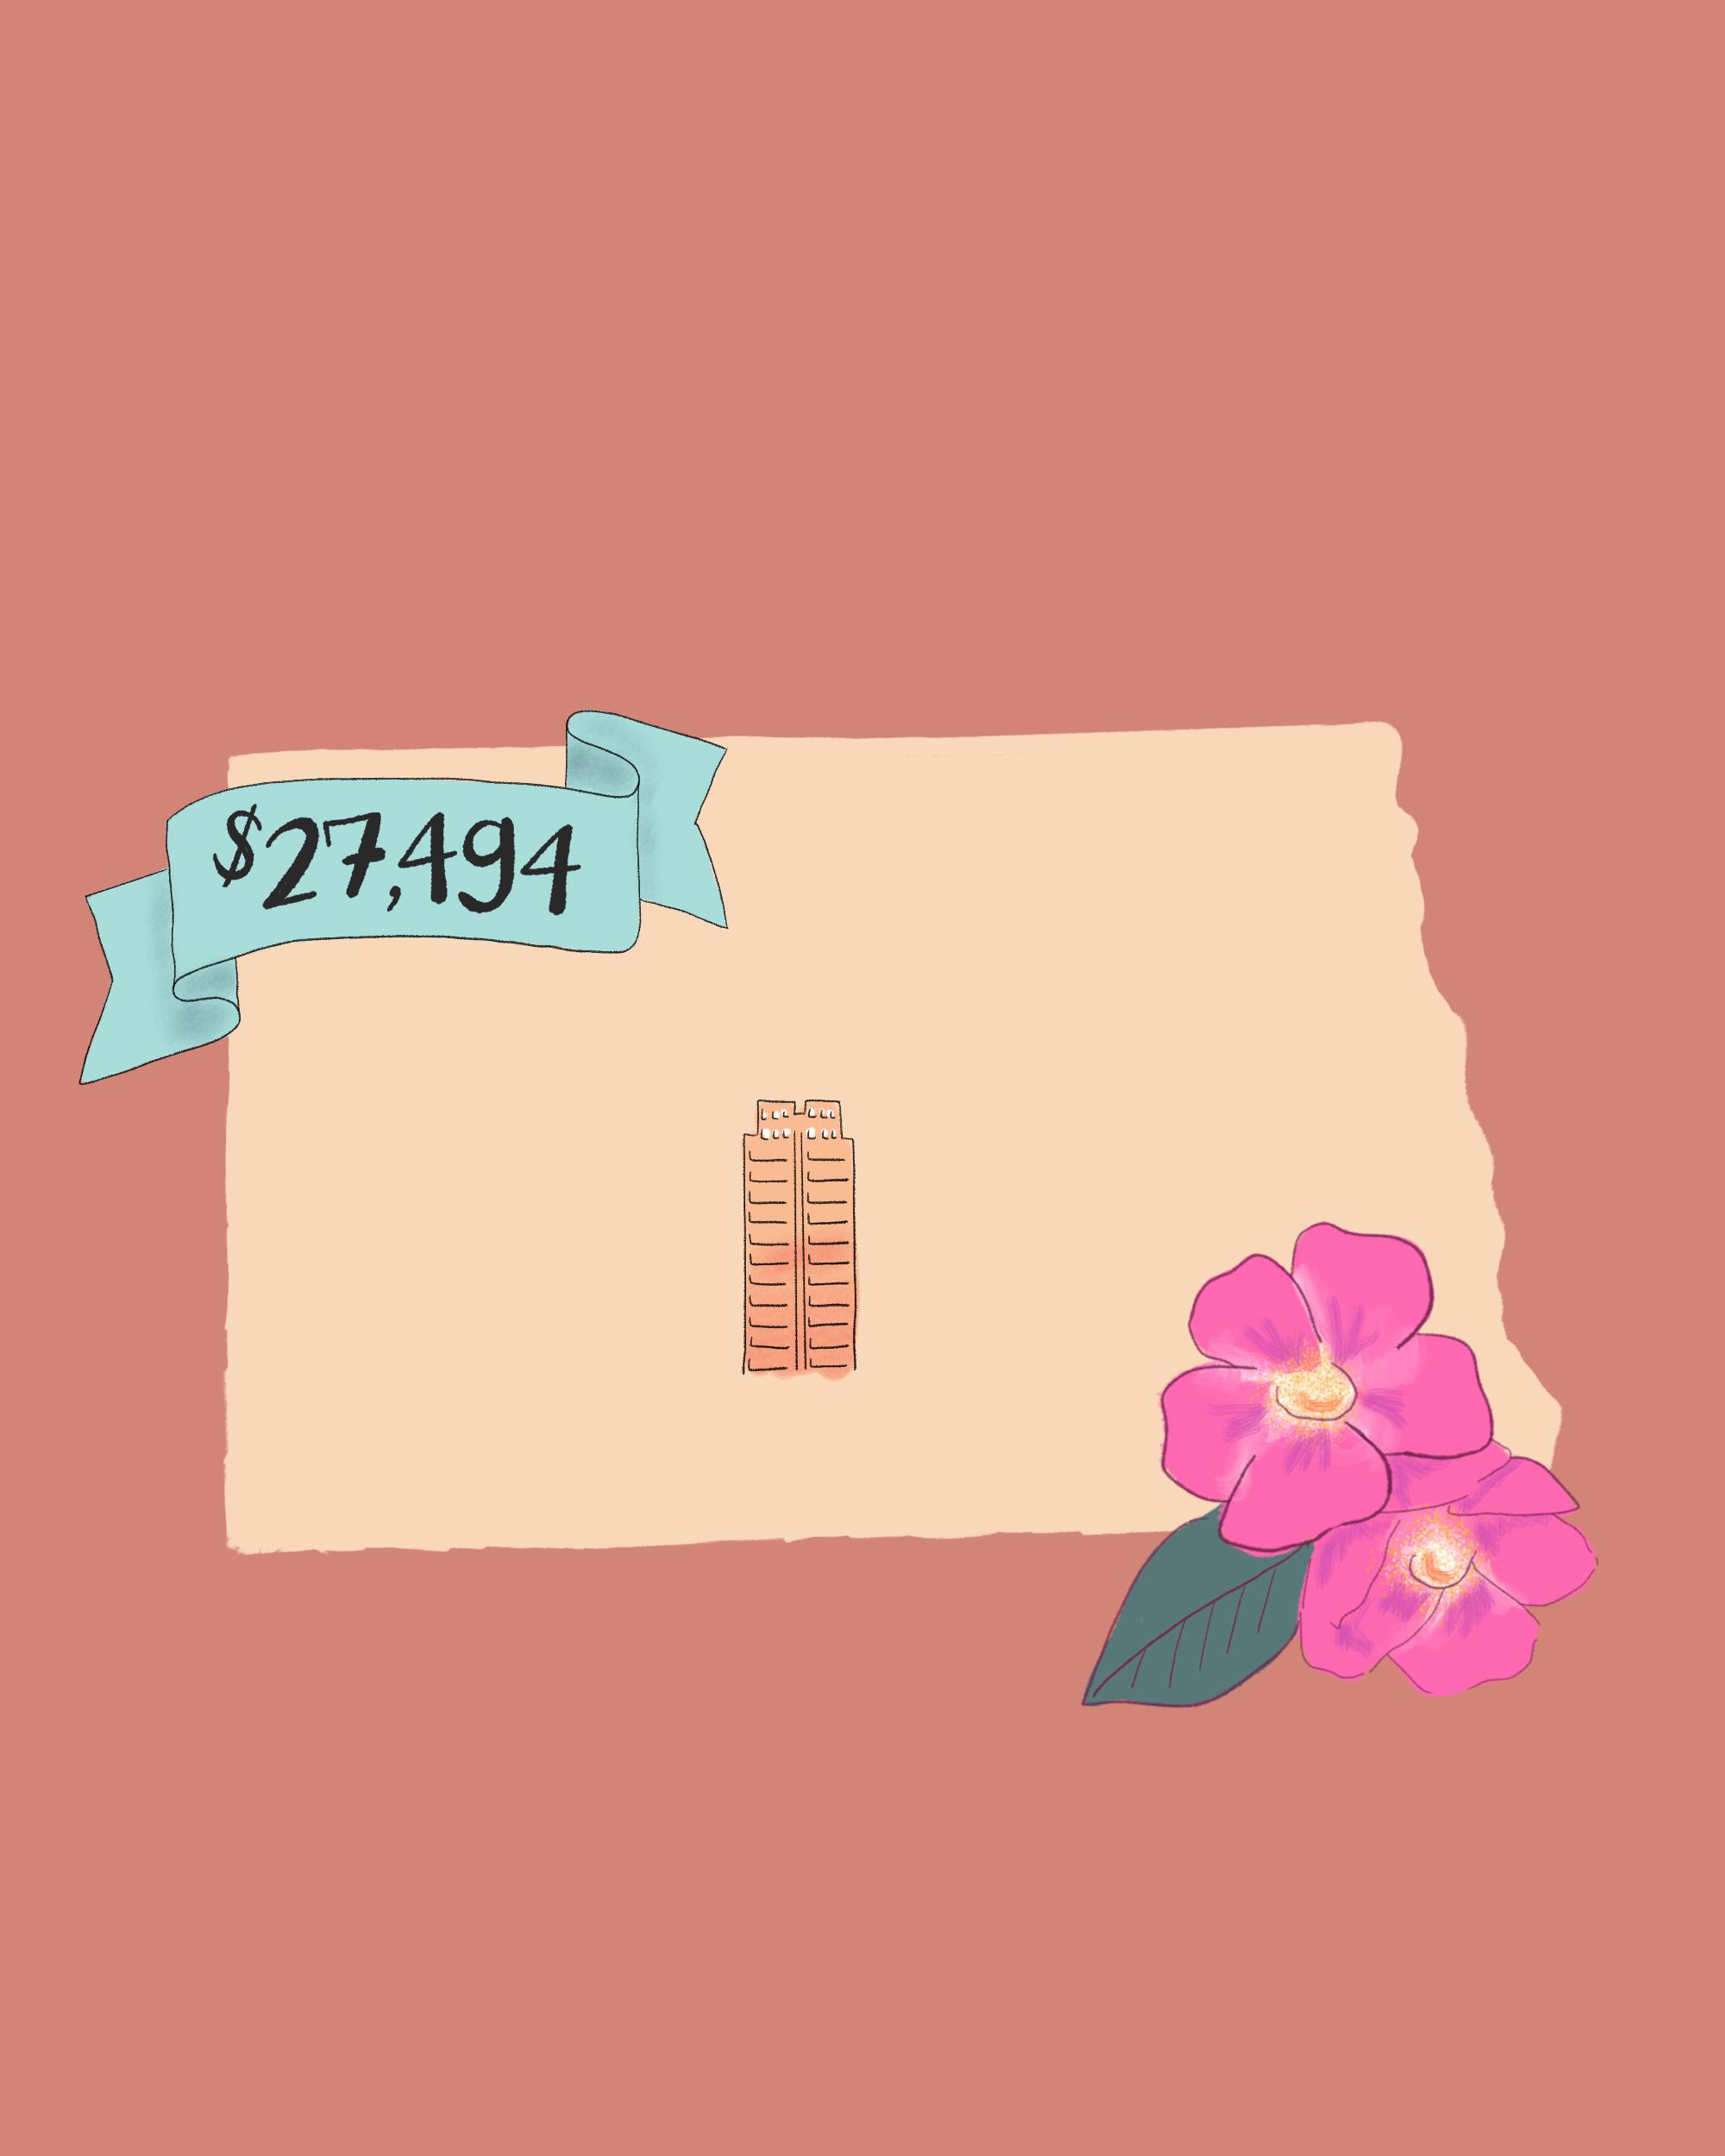 state wedding costs illustration north dakota